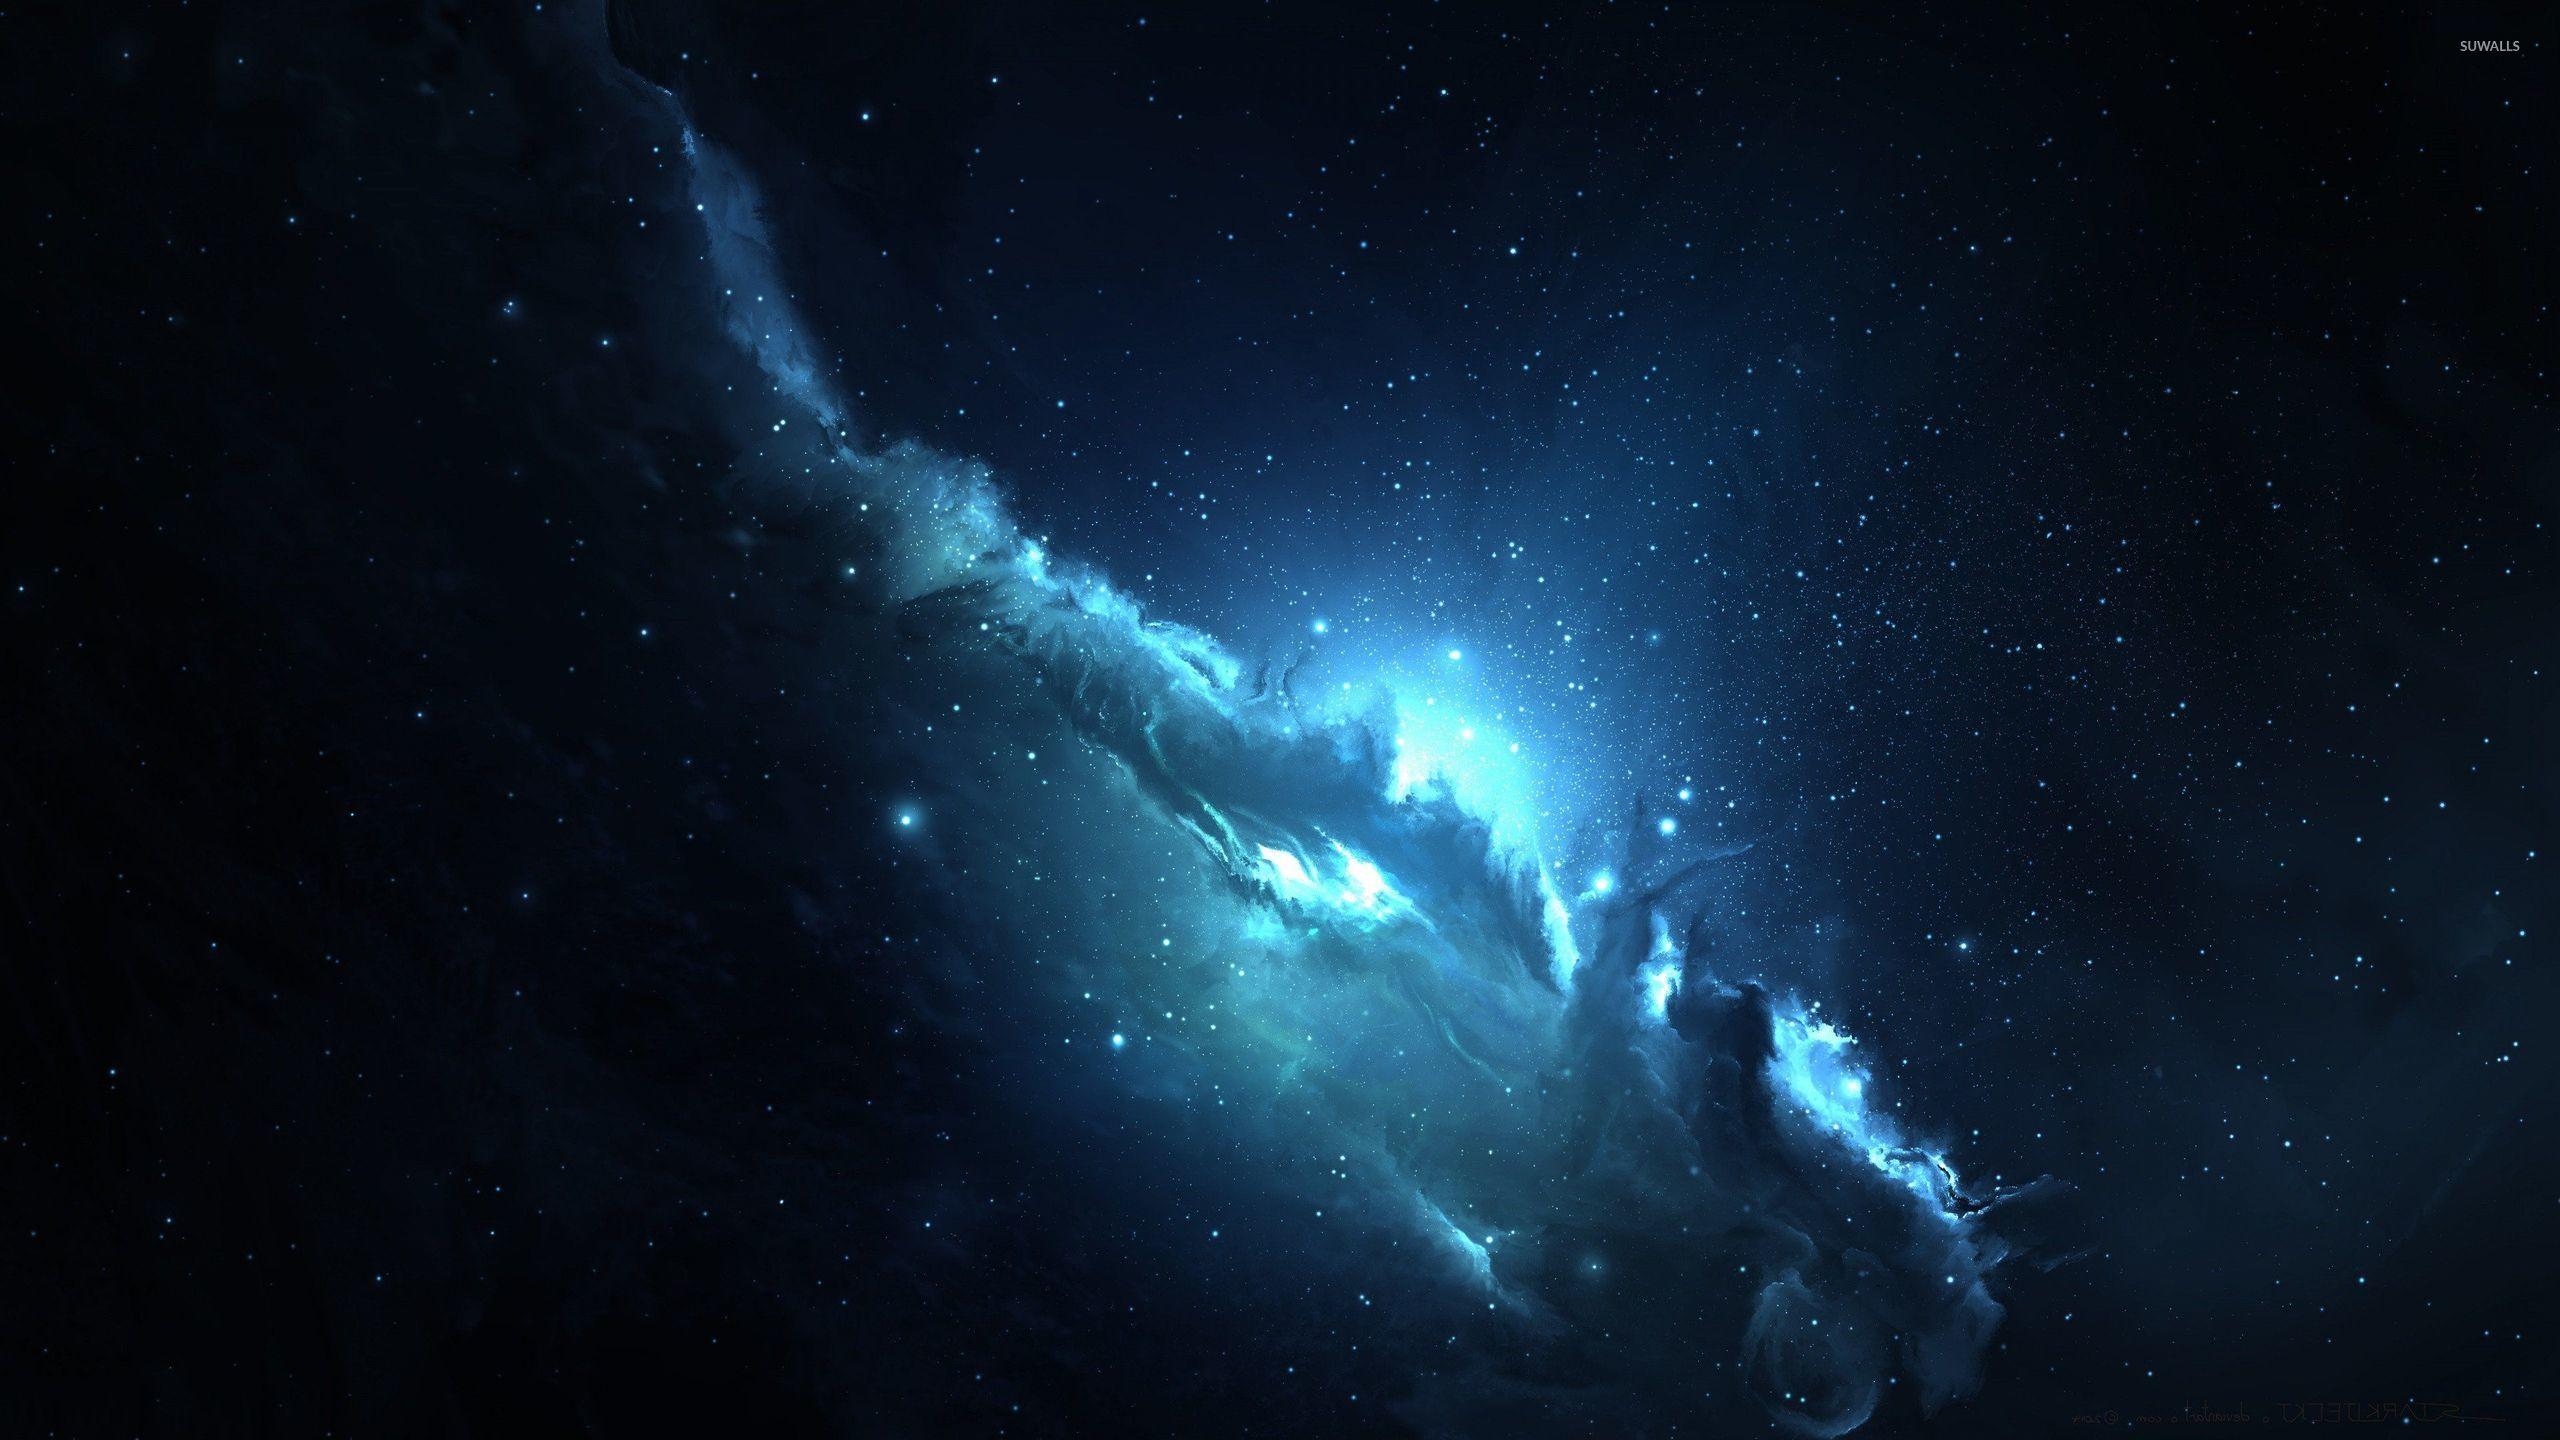 Blue nebula [3] wallpaper - Space wallpapers - #46192